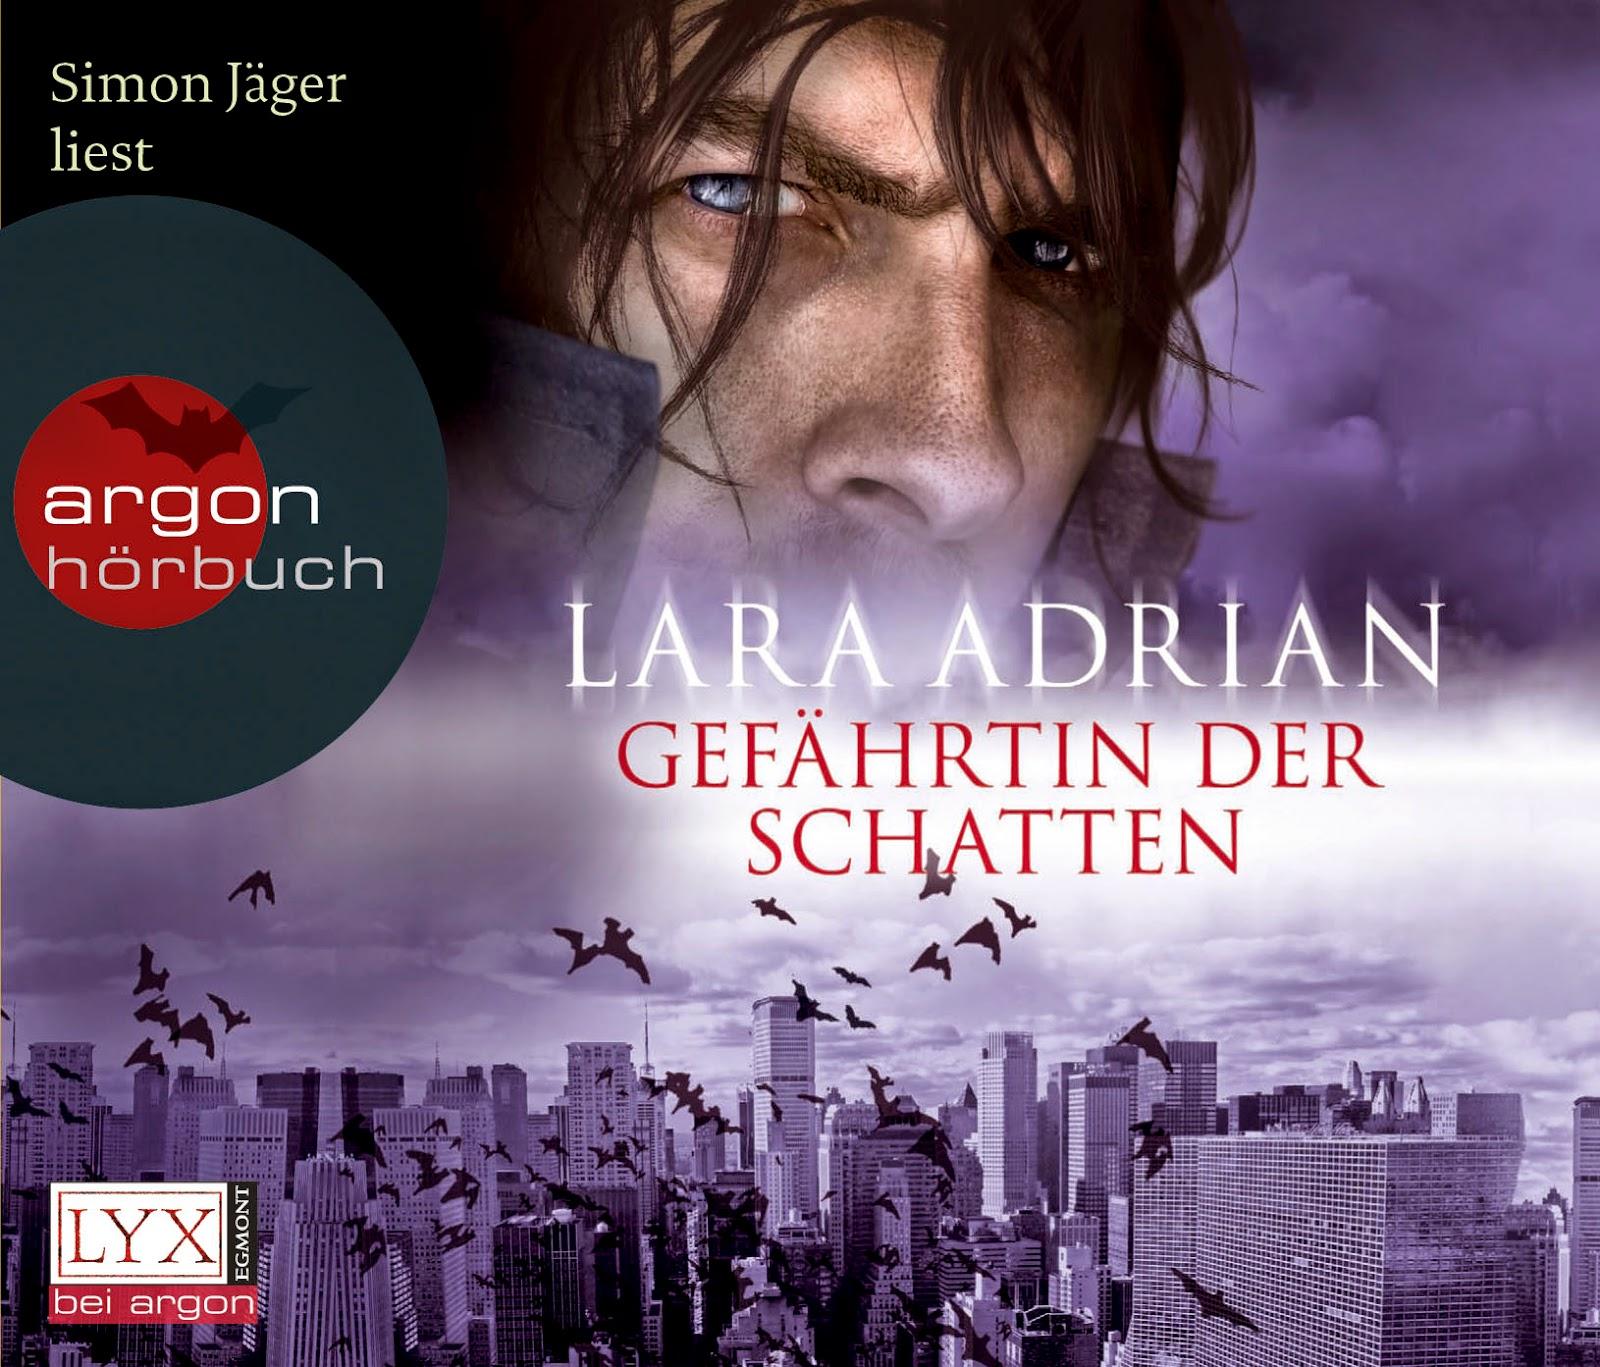 http://www.amazon.de/Gef%C3%A4hrtin-Schatten-Lara-Adrian/dp/3839810086/ref=sr_1_2?s=books&ie=UTF8&qid=1279208980&sr=1-2